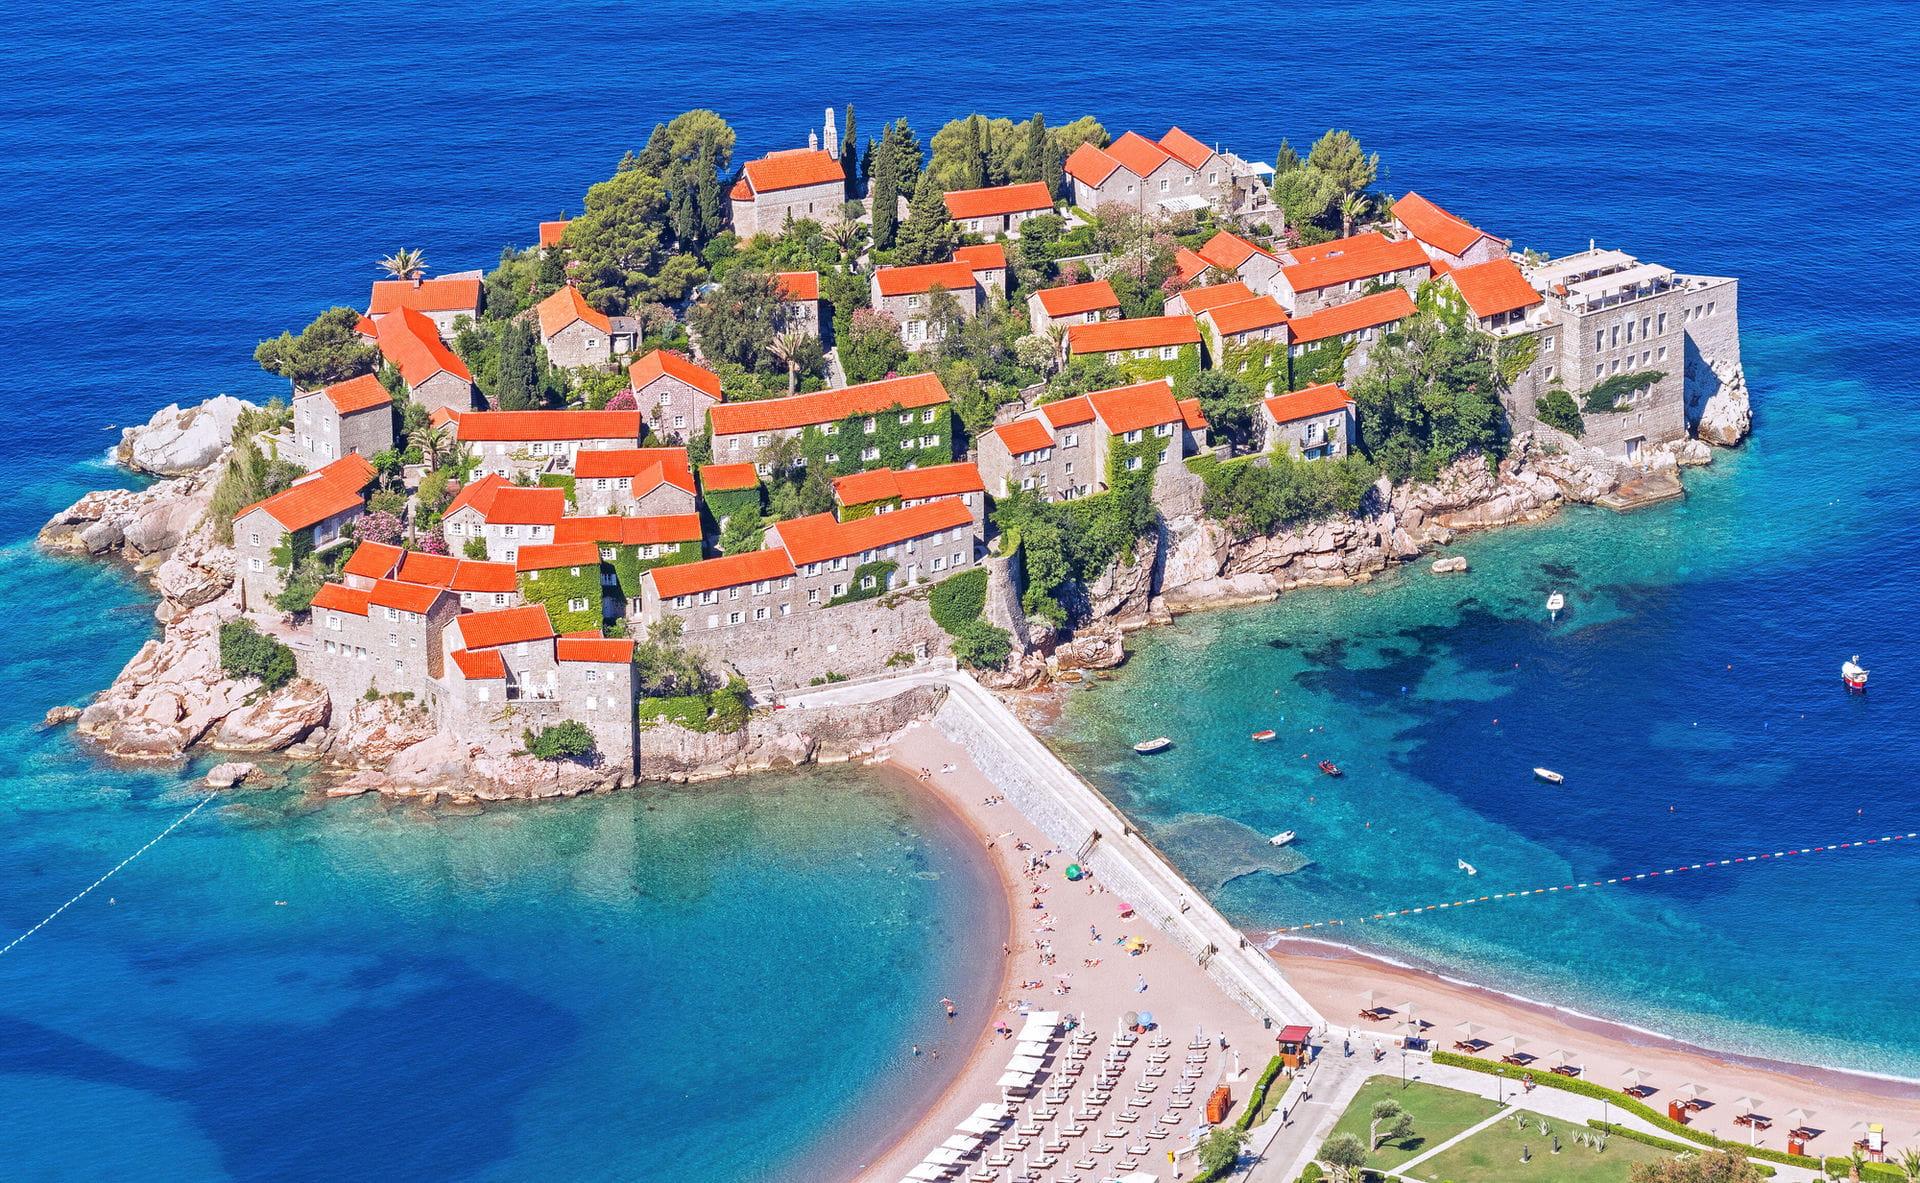 High quality hoto of Sveti Stefan - Montenegro